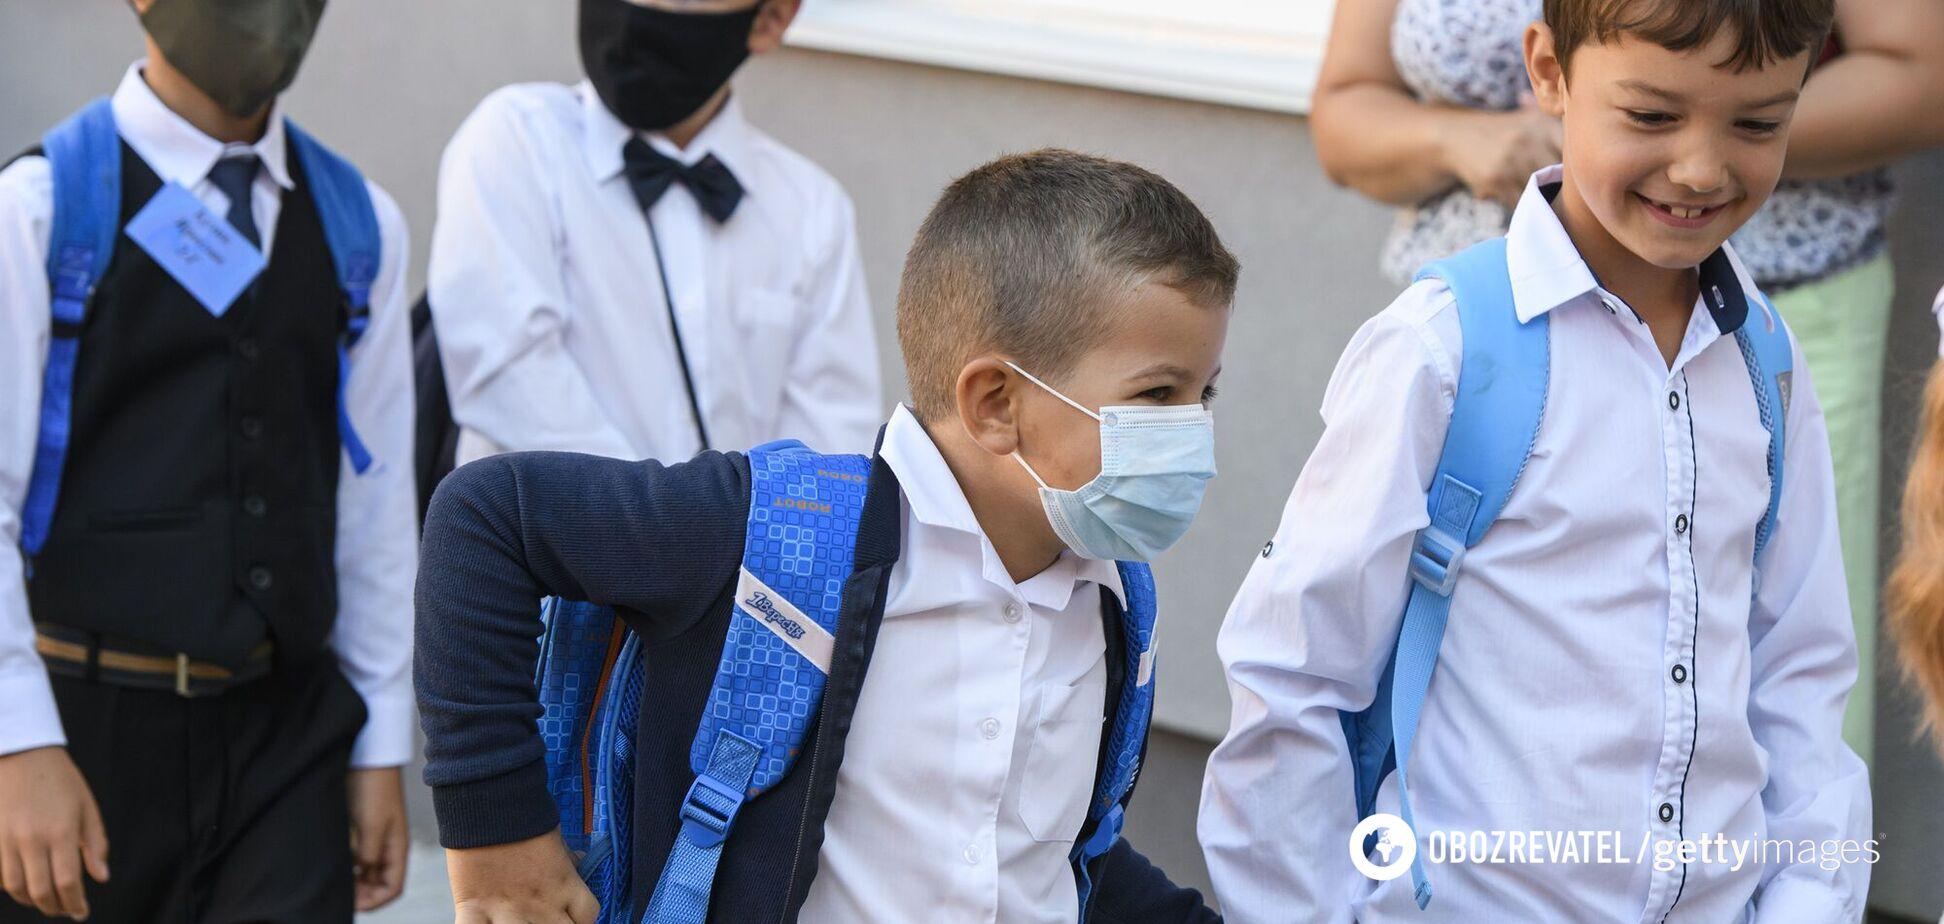 Кличко заявил о росте заболеваемости COVID-19 в школах Киева